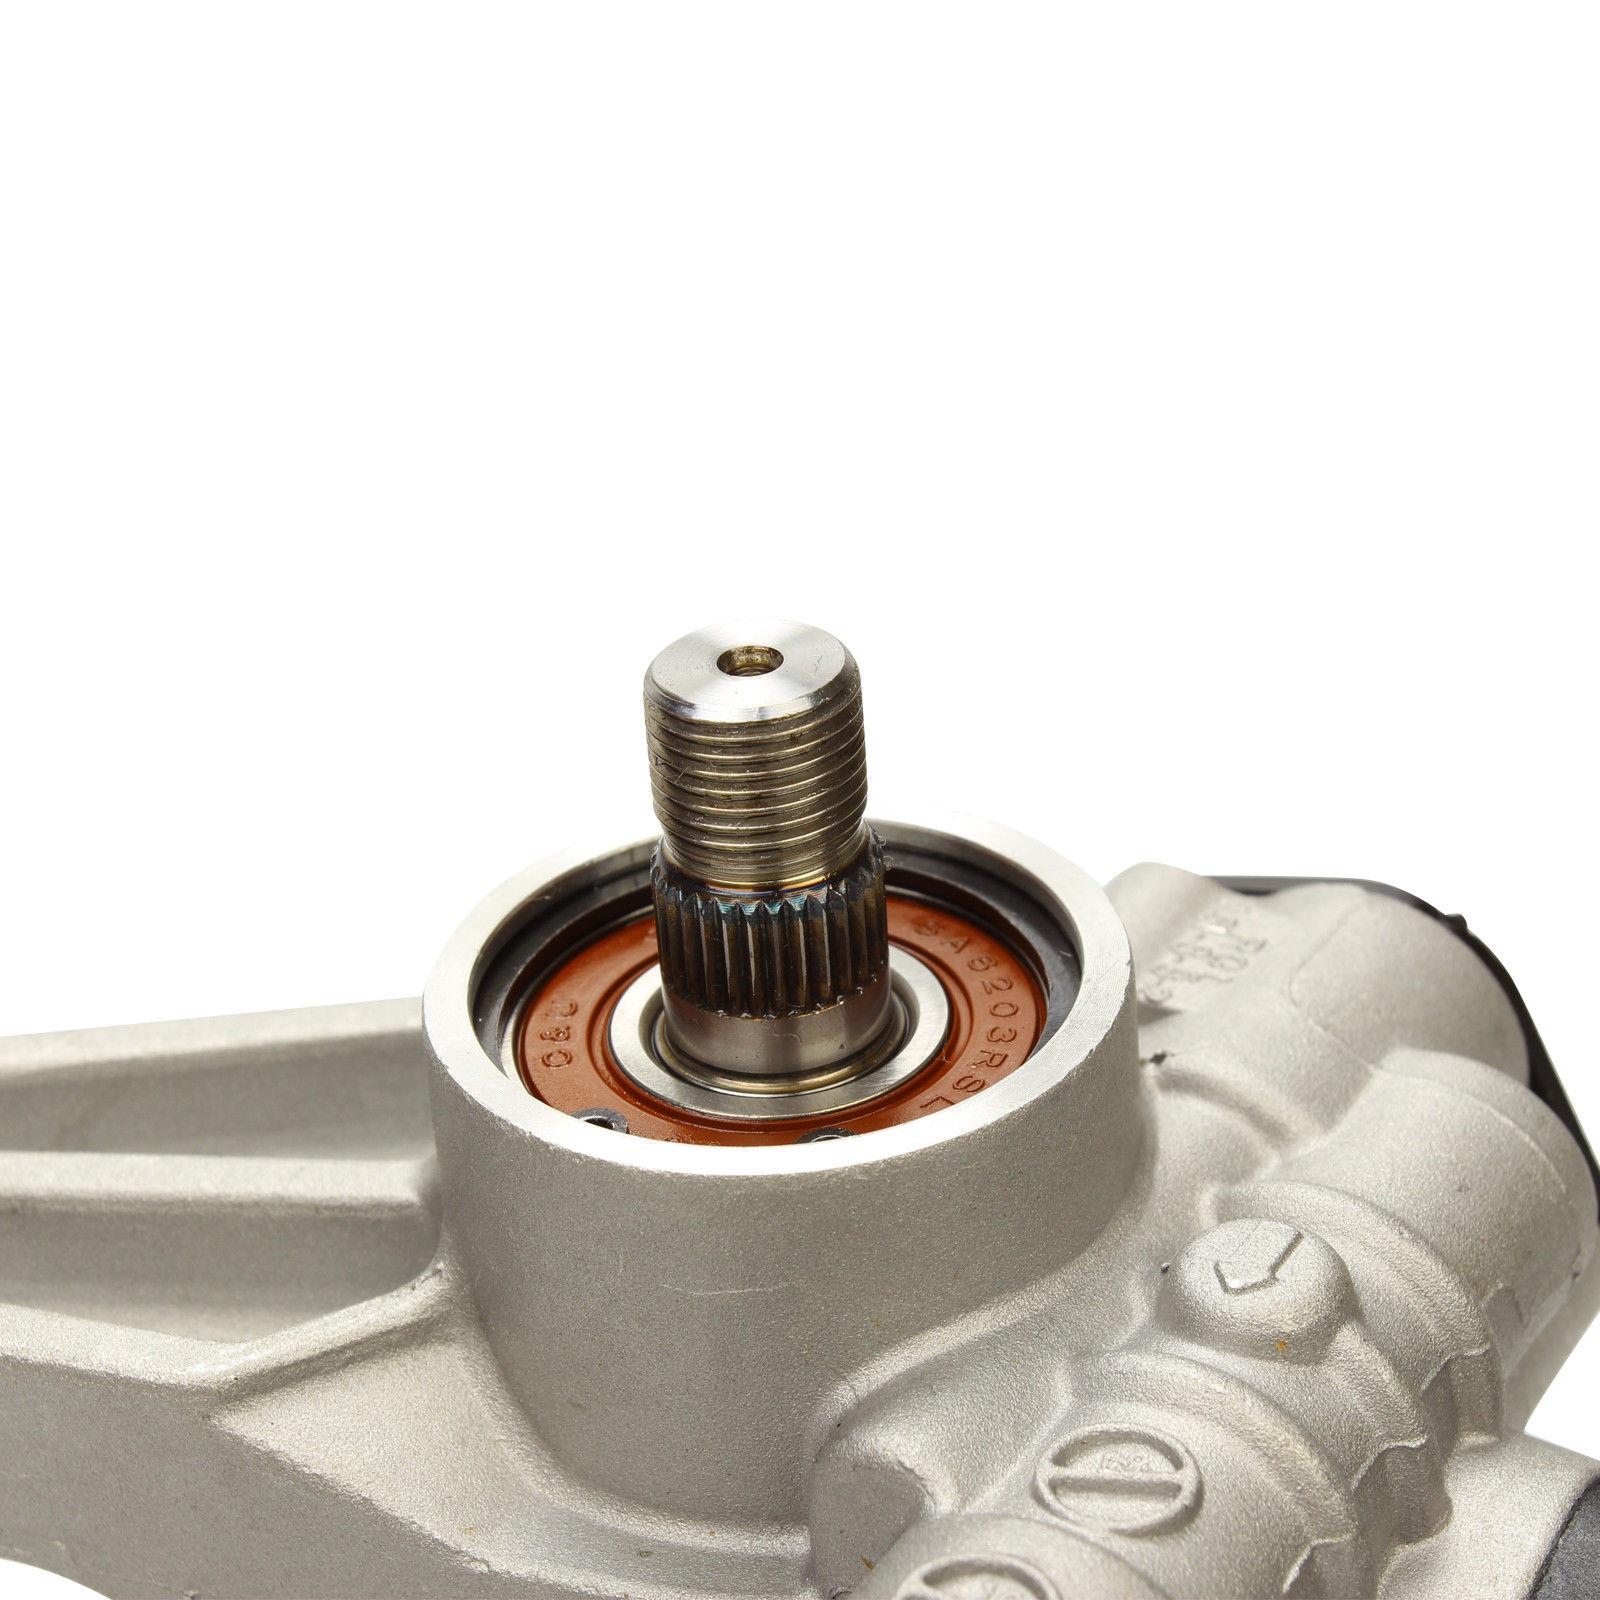 56110RDAA01 Power Steering Pump For 2004-2008 Honda Pilot